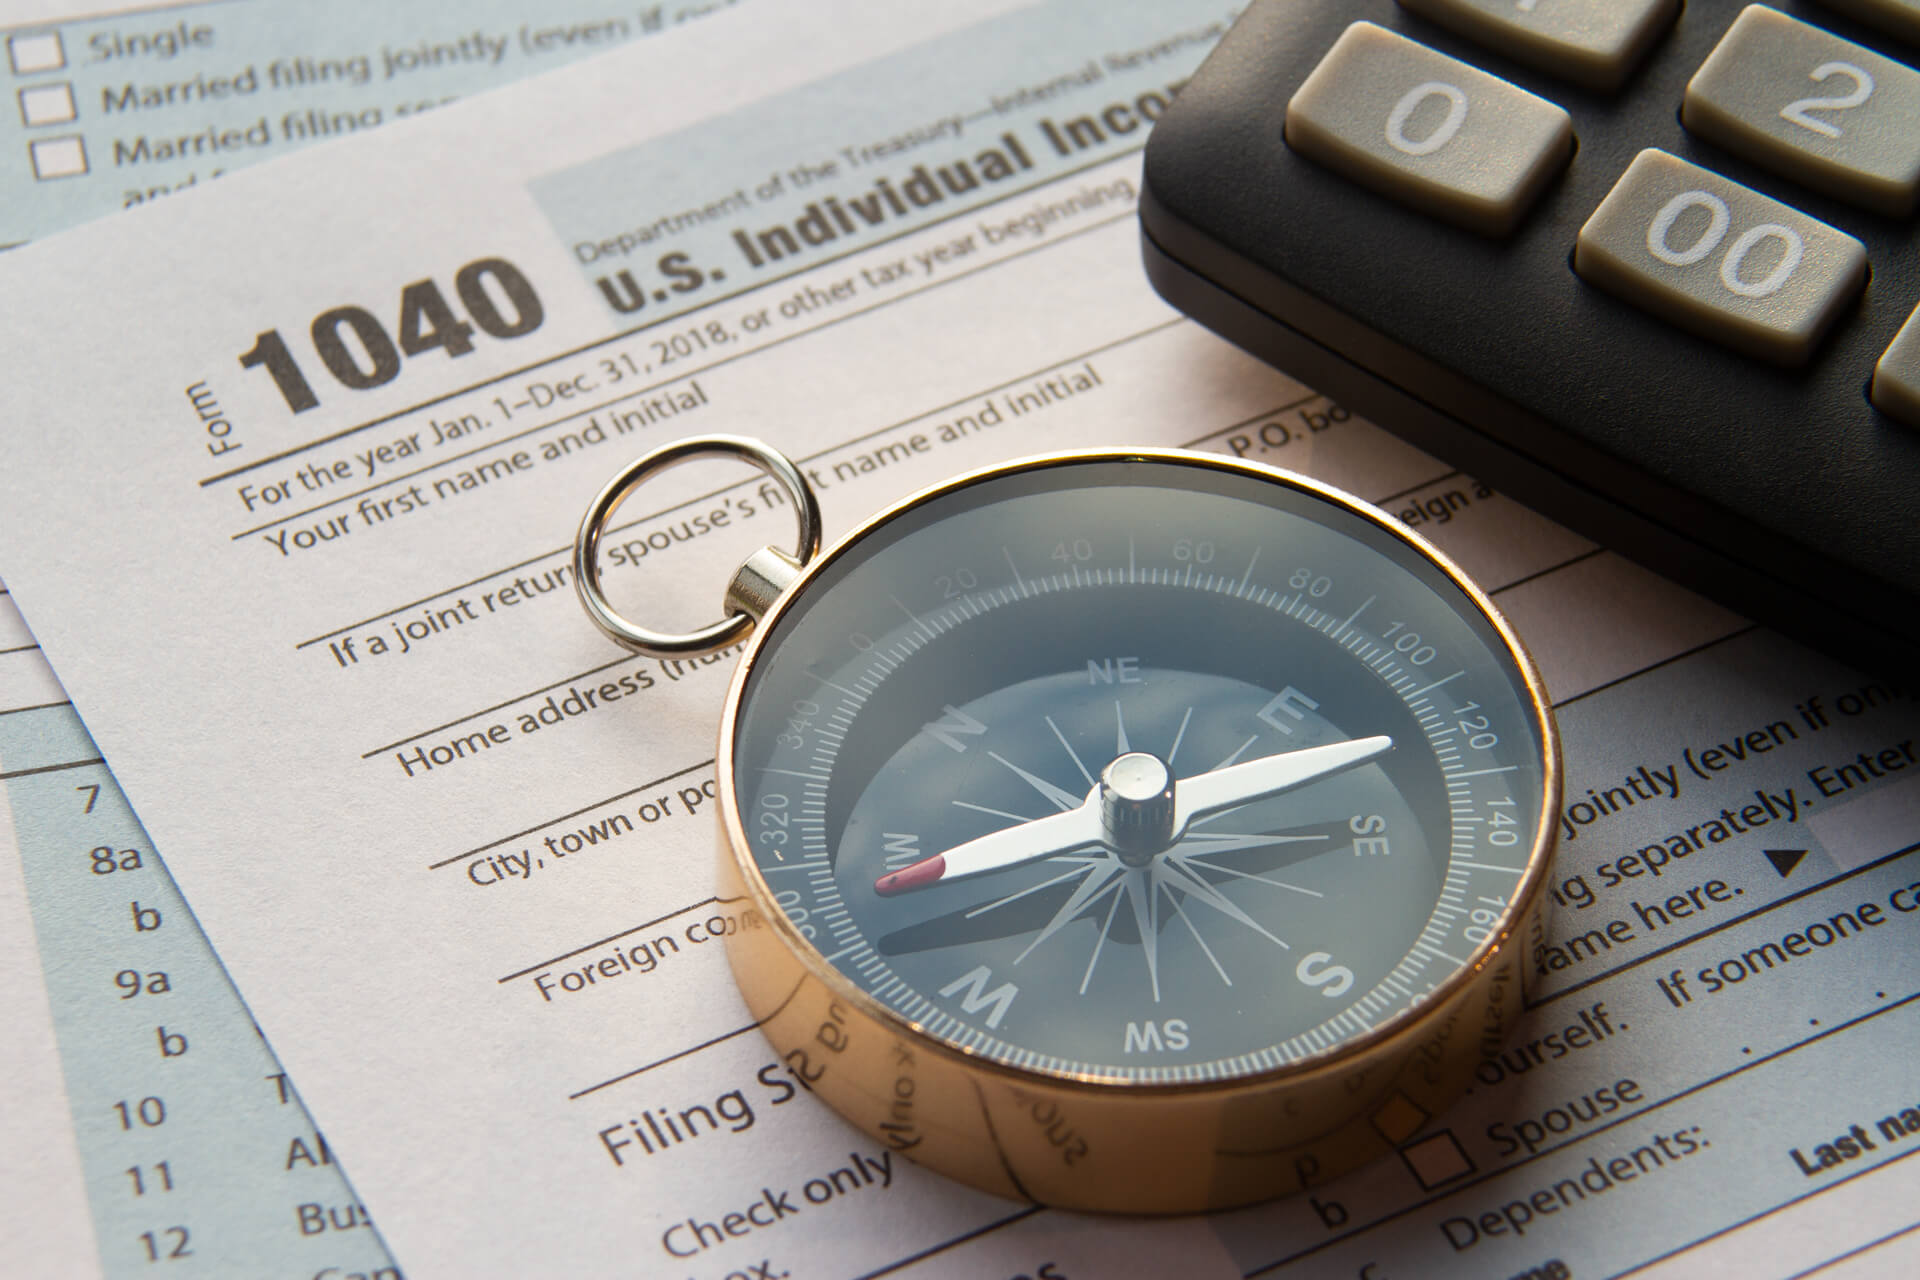 compass, calculator, 1040 tax form, strategic tax resolution